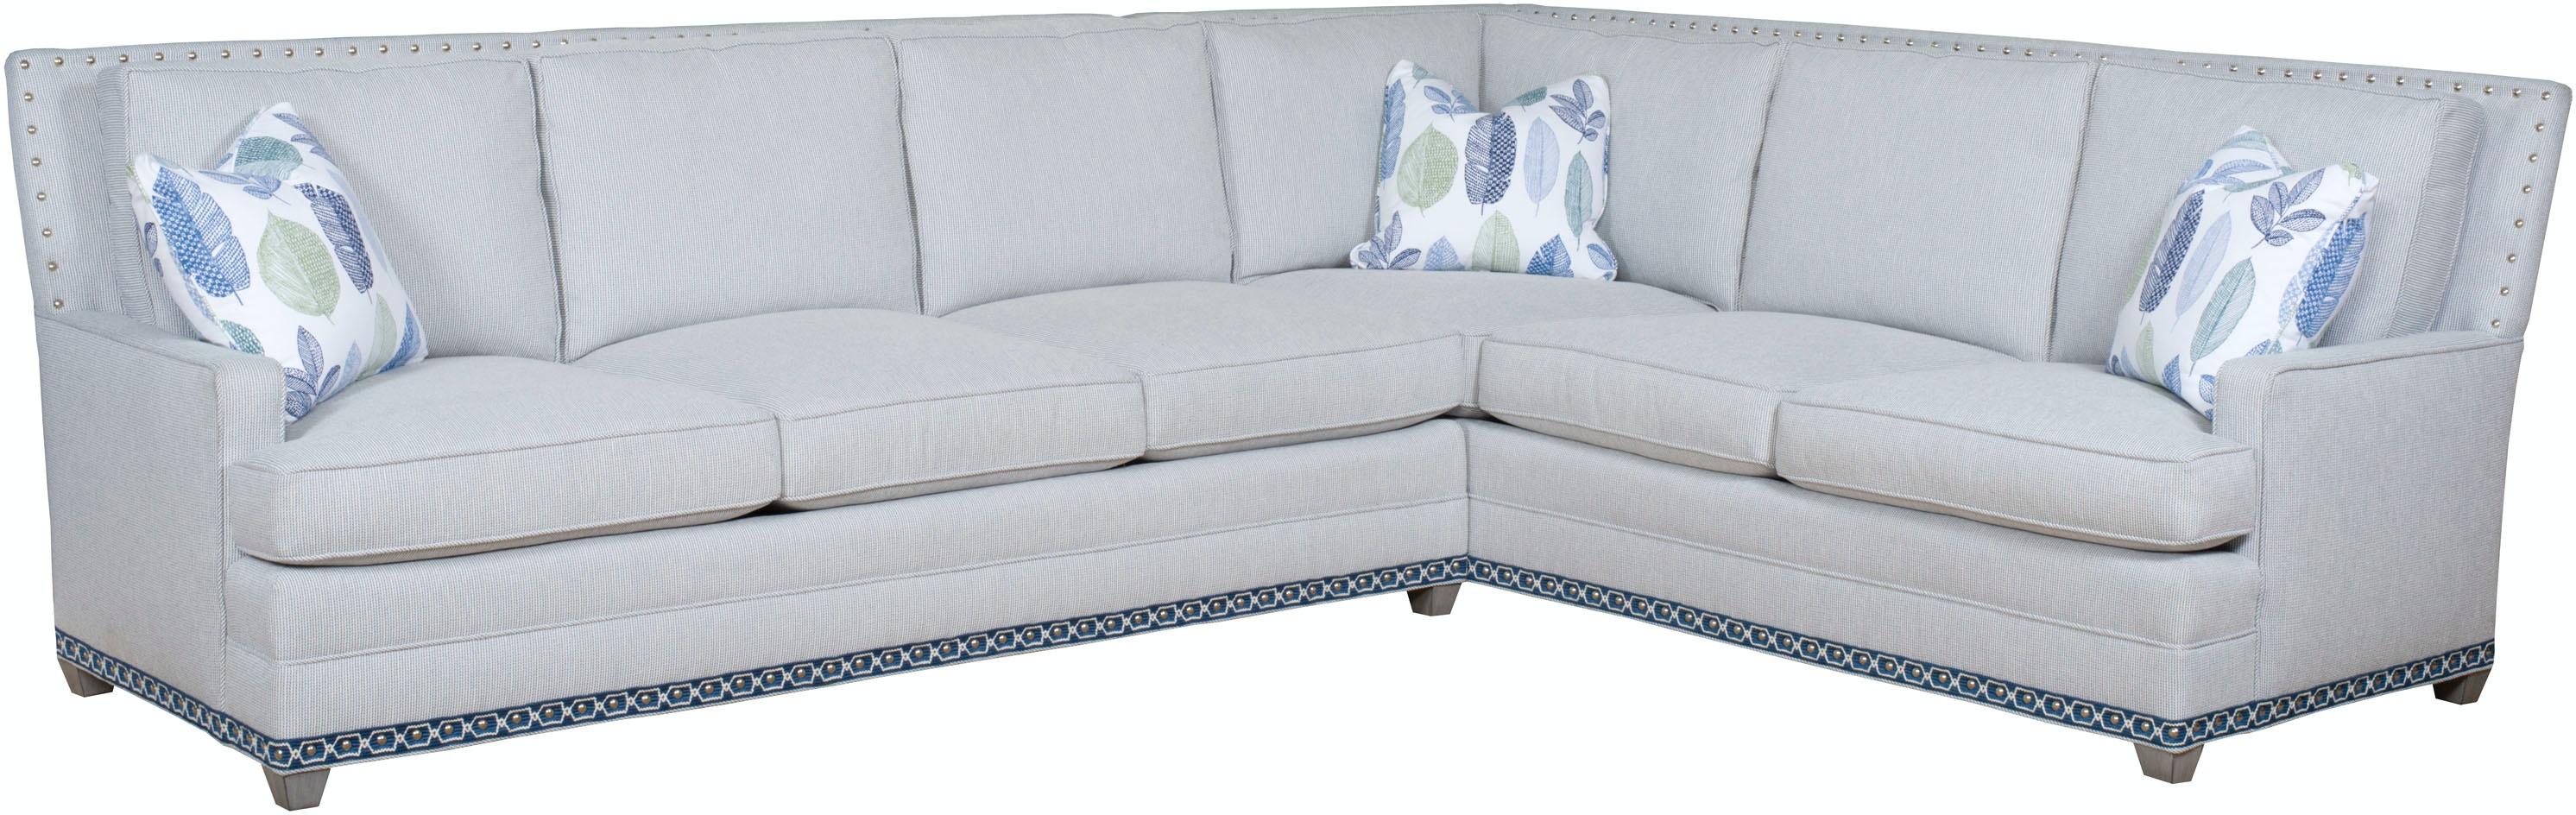 Vanguard Furniture 604 LAS Living Room Riverside Left Arm Sofa